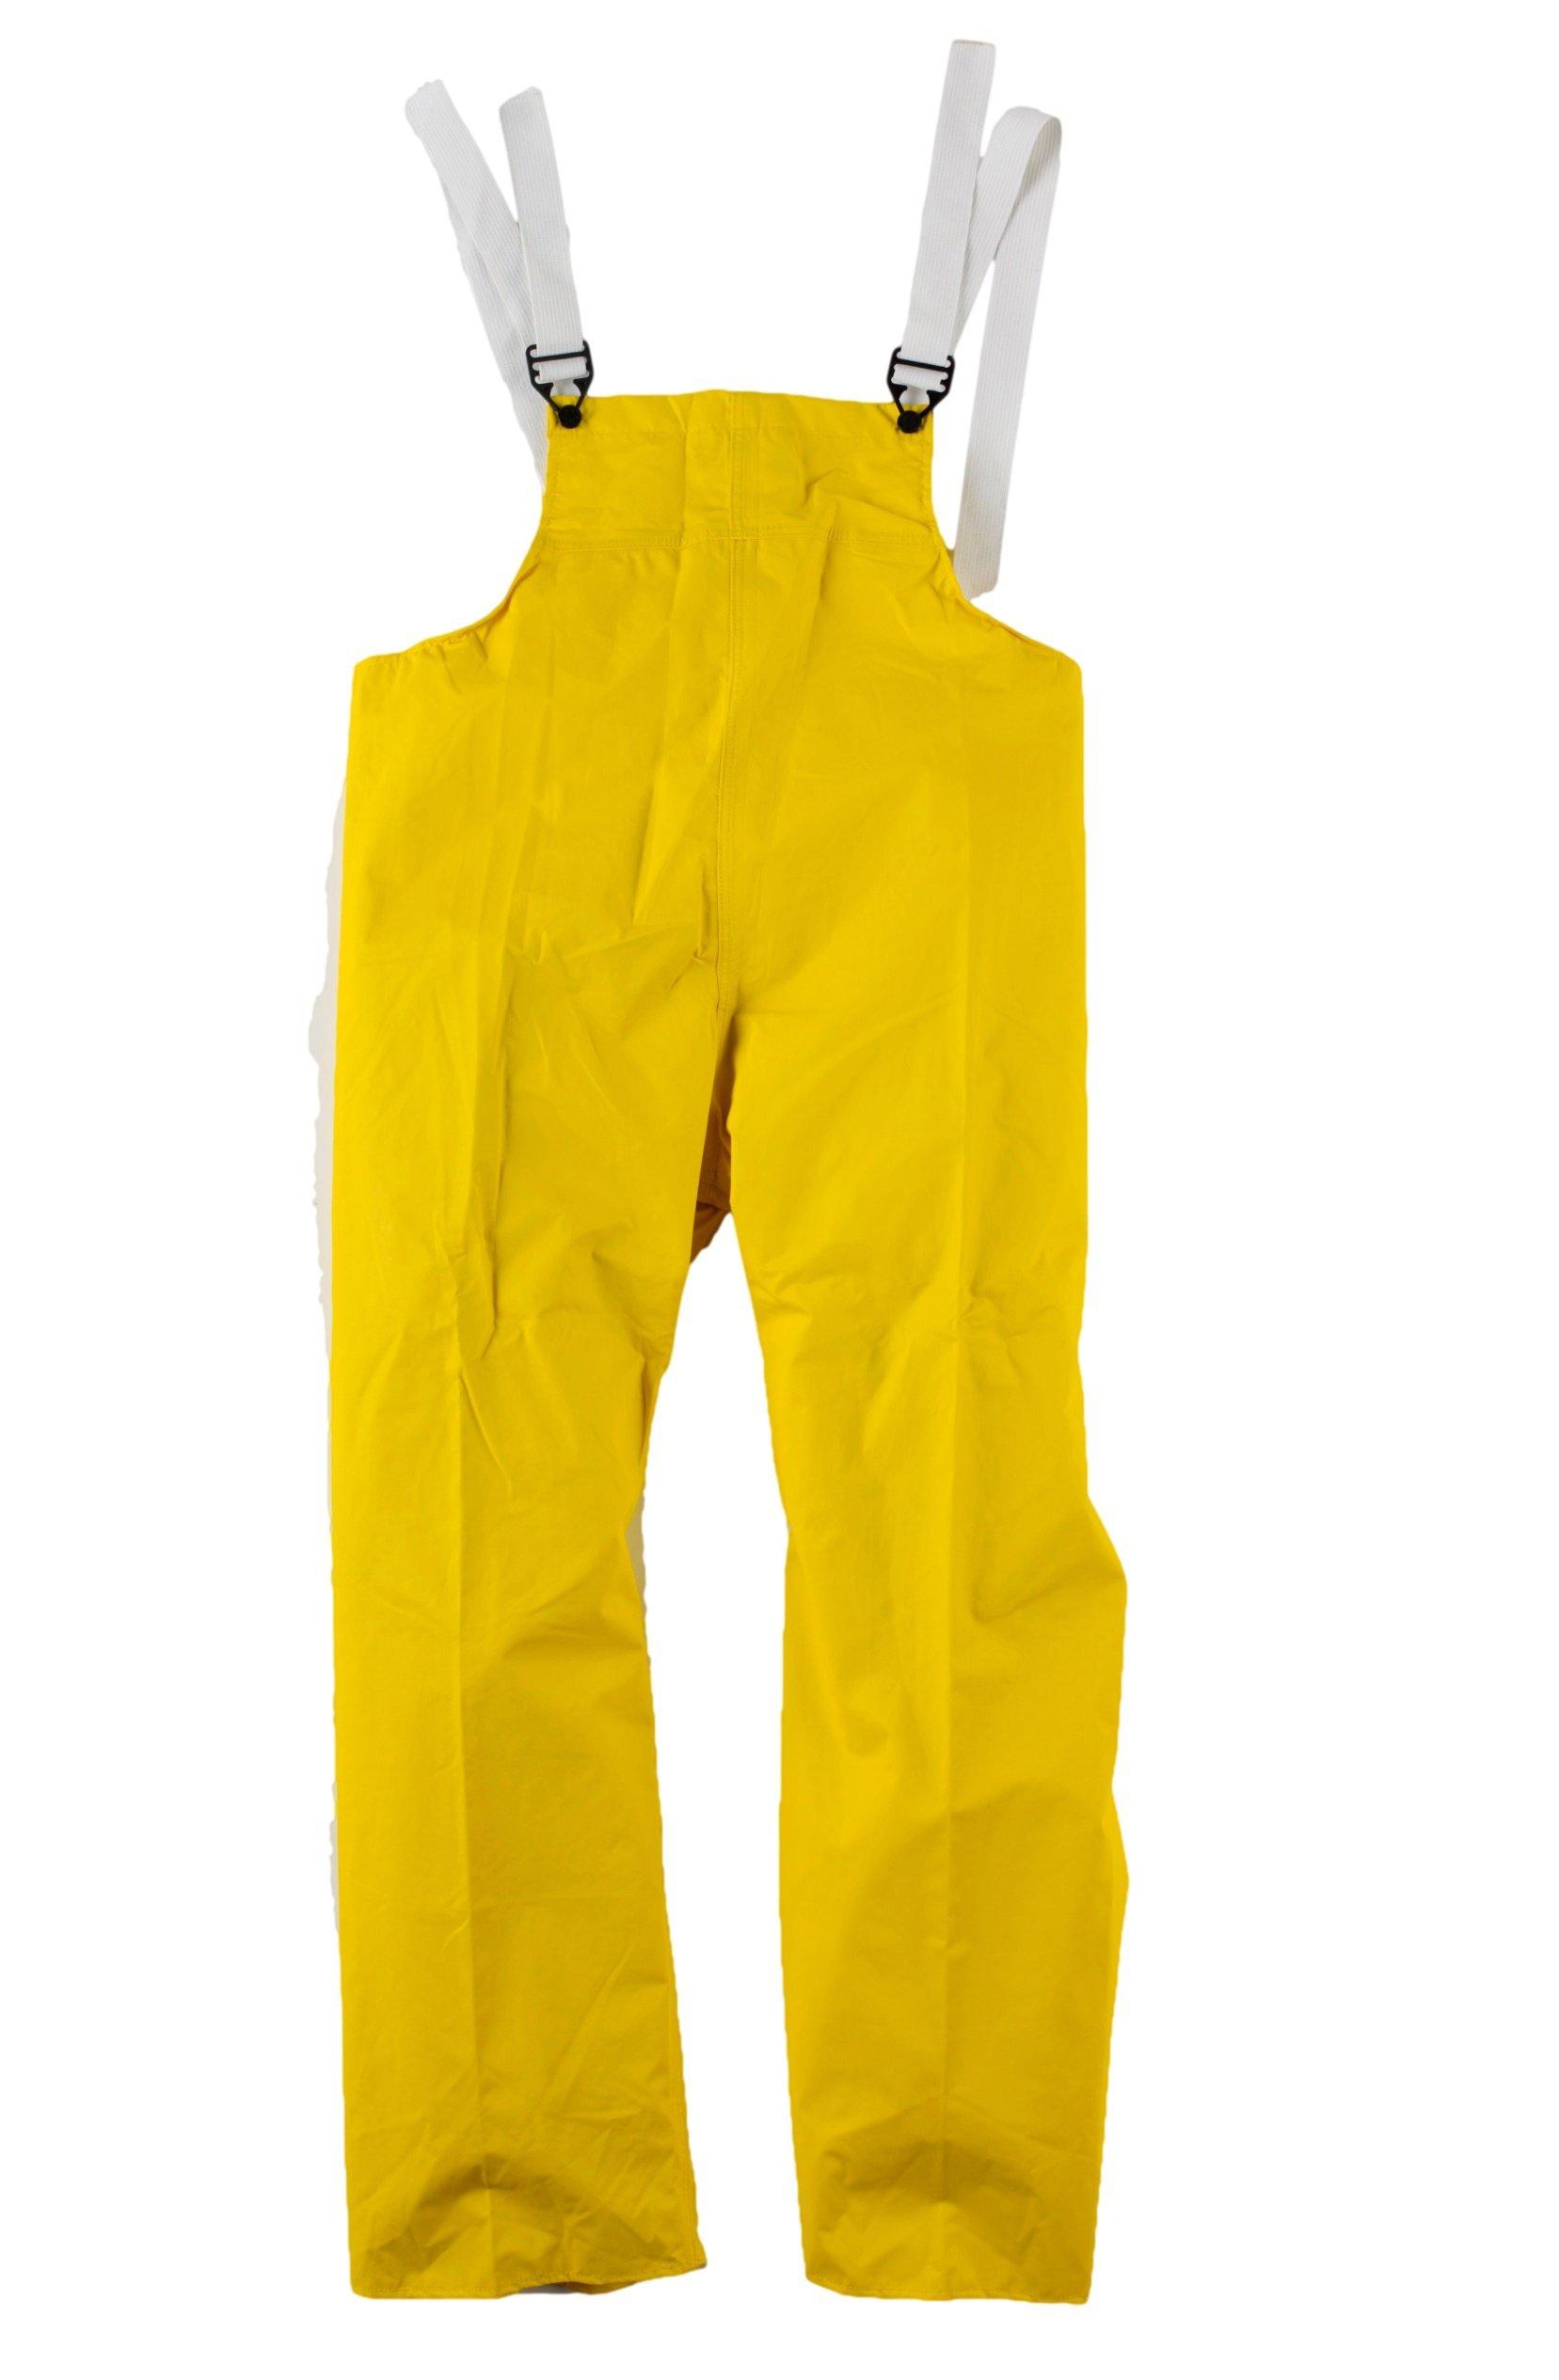 Neese 35BT Flame Resistant PVC/Nylon Universal 35 Bib Style Rain Trouser with Elastic Suspenders, Medium, Yellow